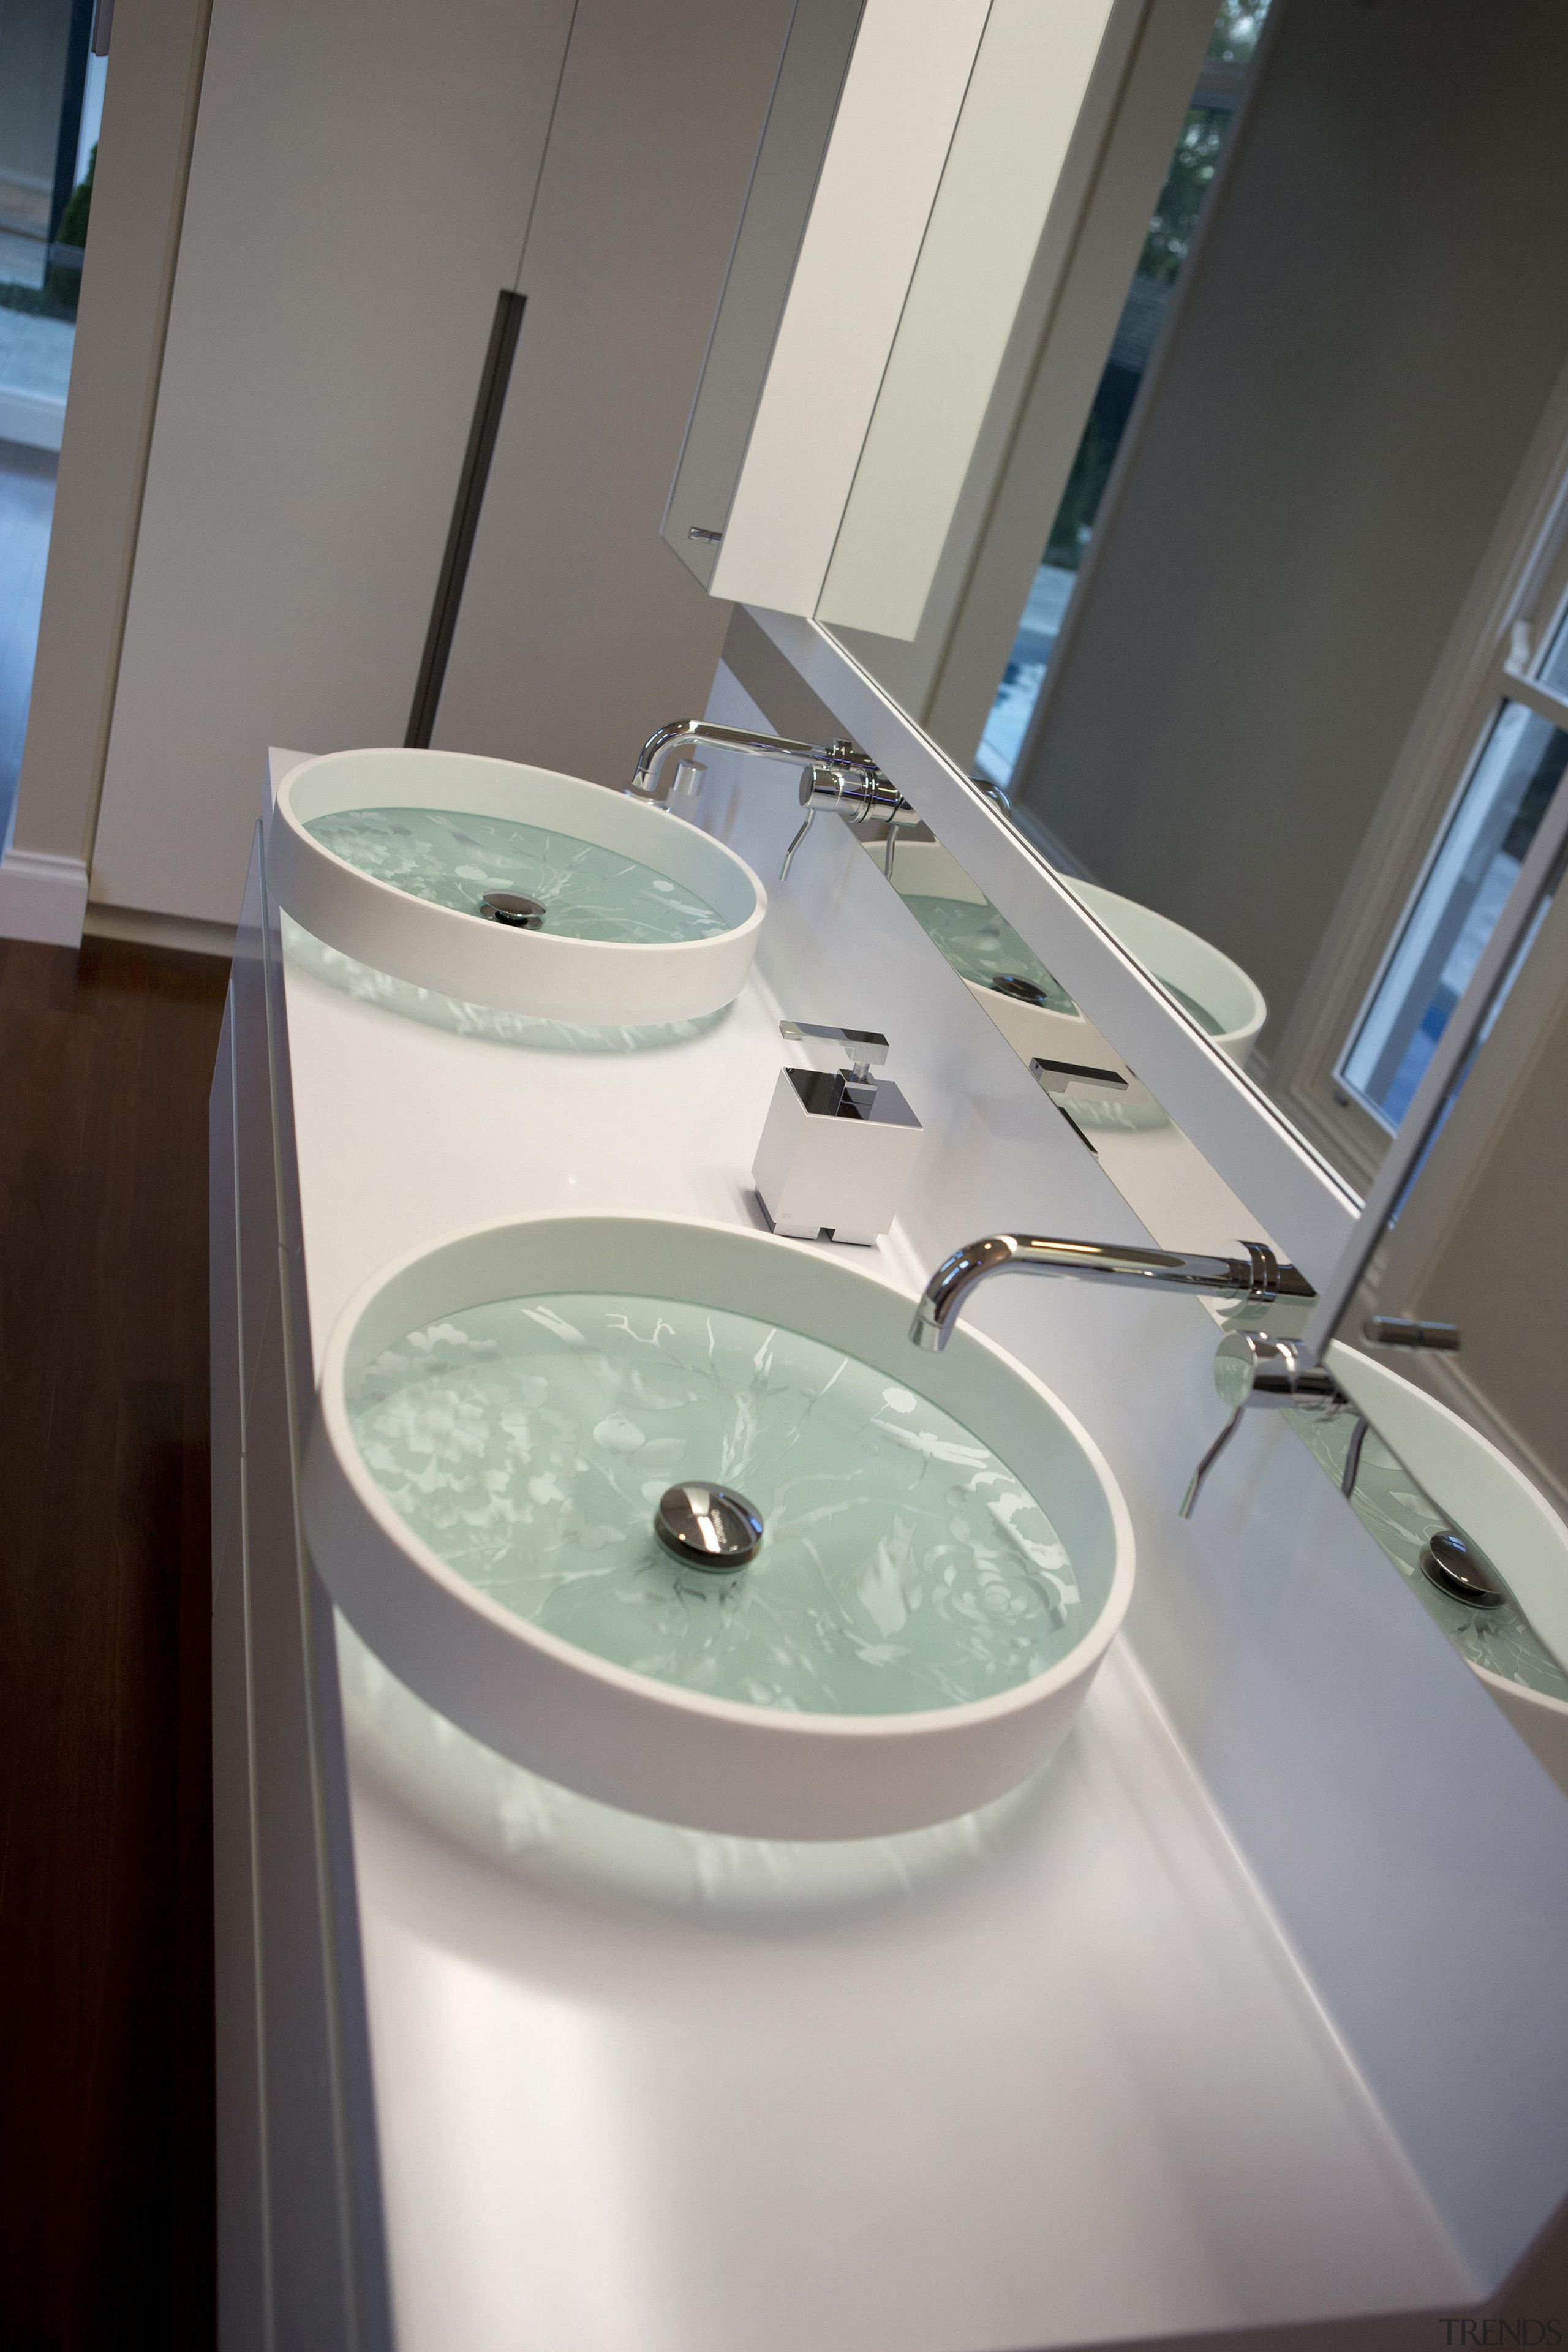 Winner Bathroom of the Year ACT Sthn NSW bathroom, bidet, glass, plumbing fixture, product design, room, sink, tap, toilet seat, gray